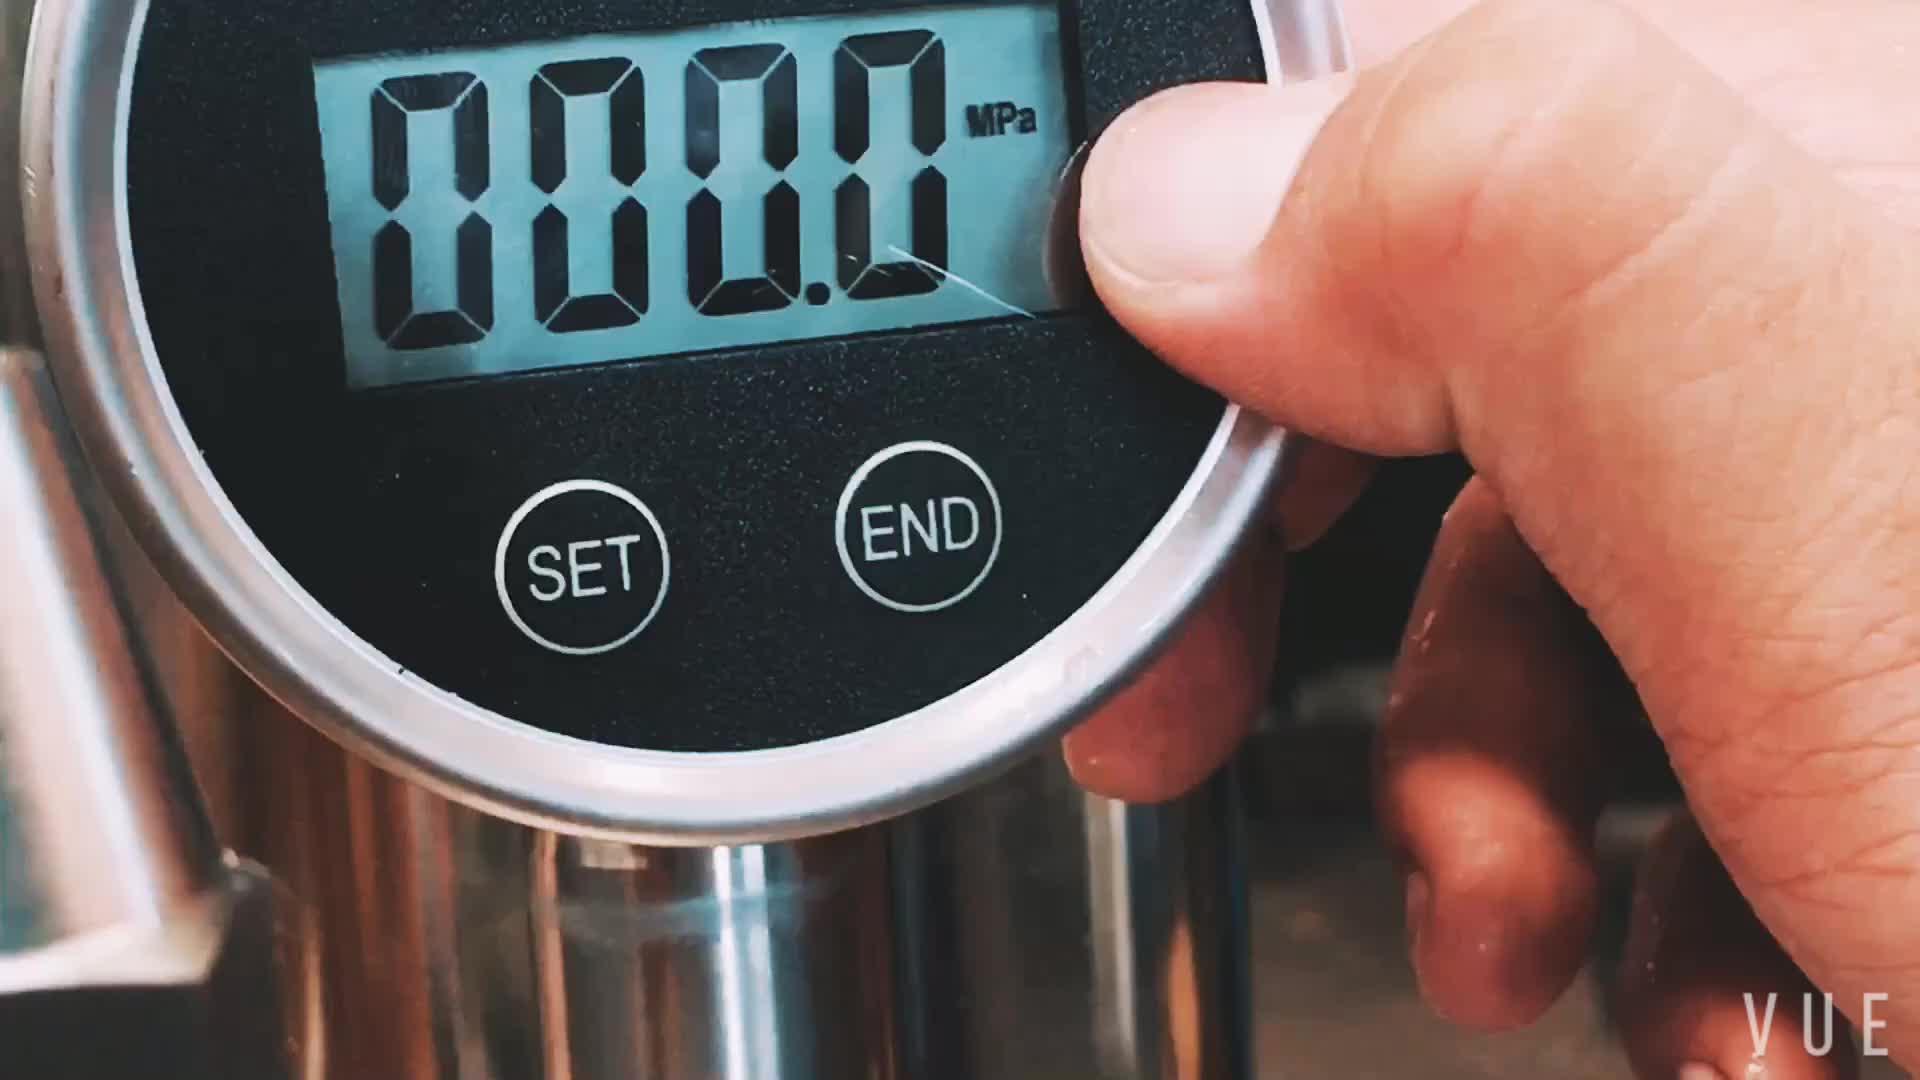 उच्च दबाव homogenizer/प्रयोगशाला homogenizer कीमत